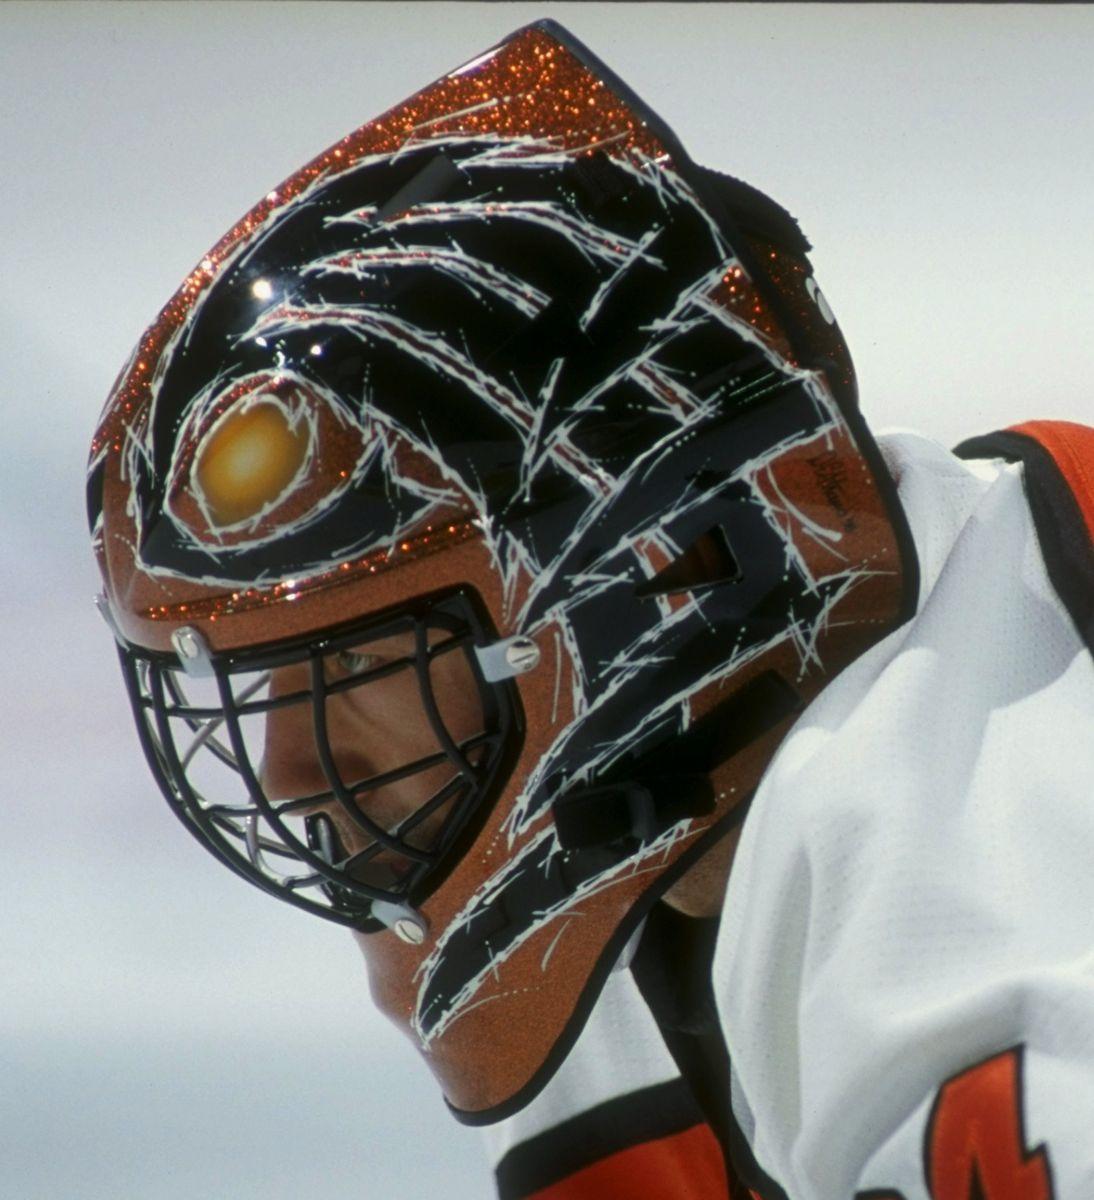 John Vanbiesbrouck's shiny Armadillo mask. I love the